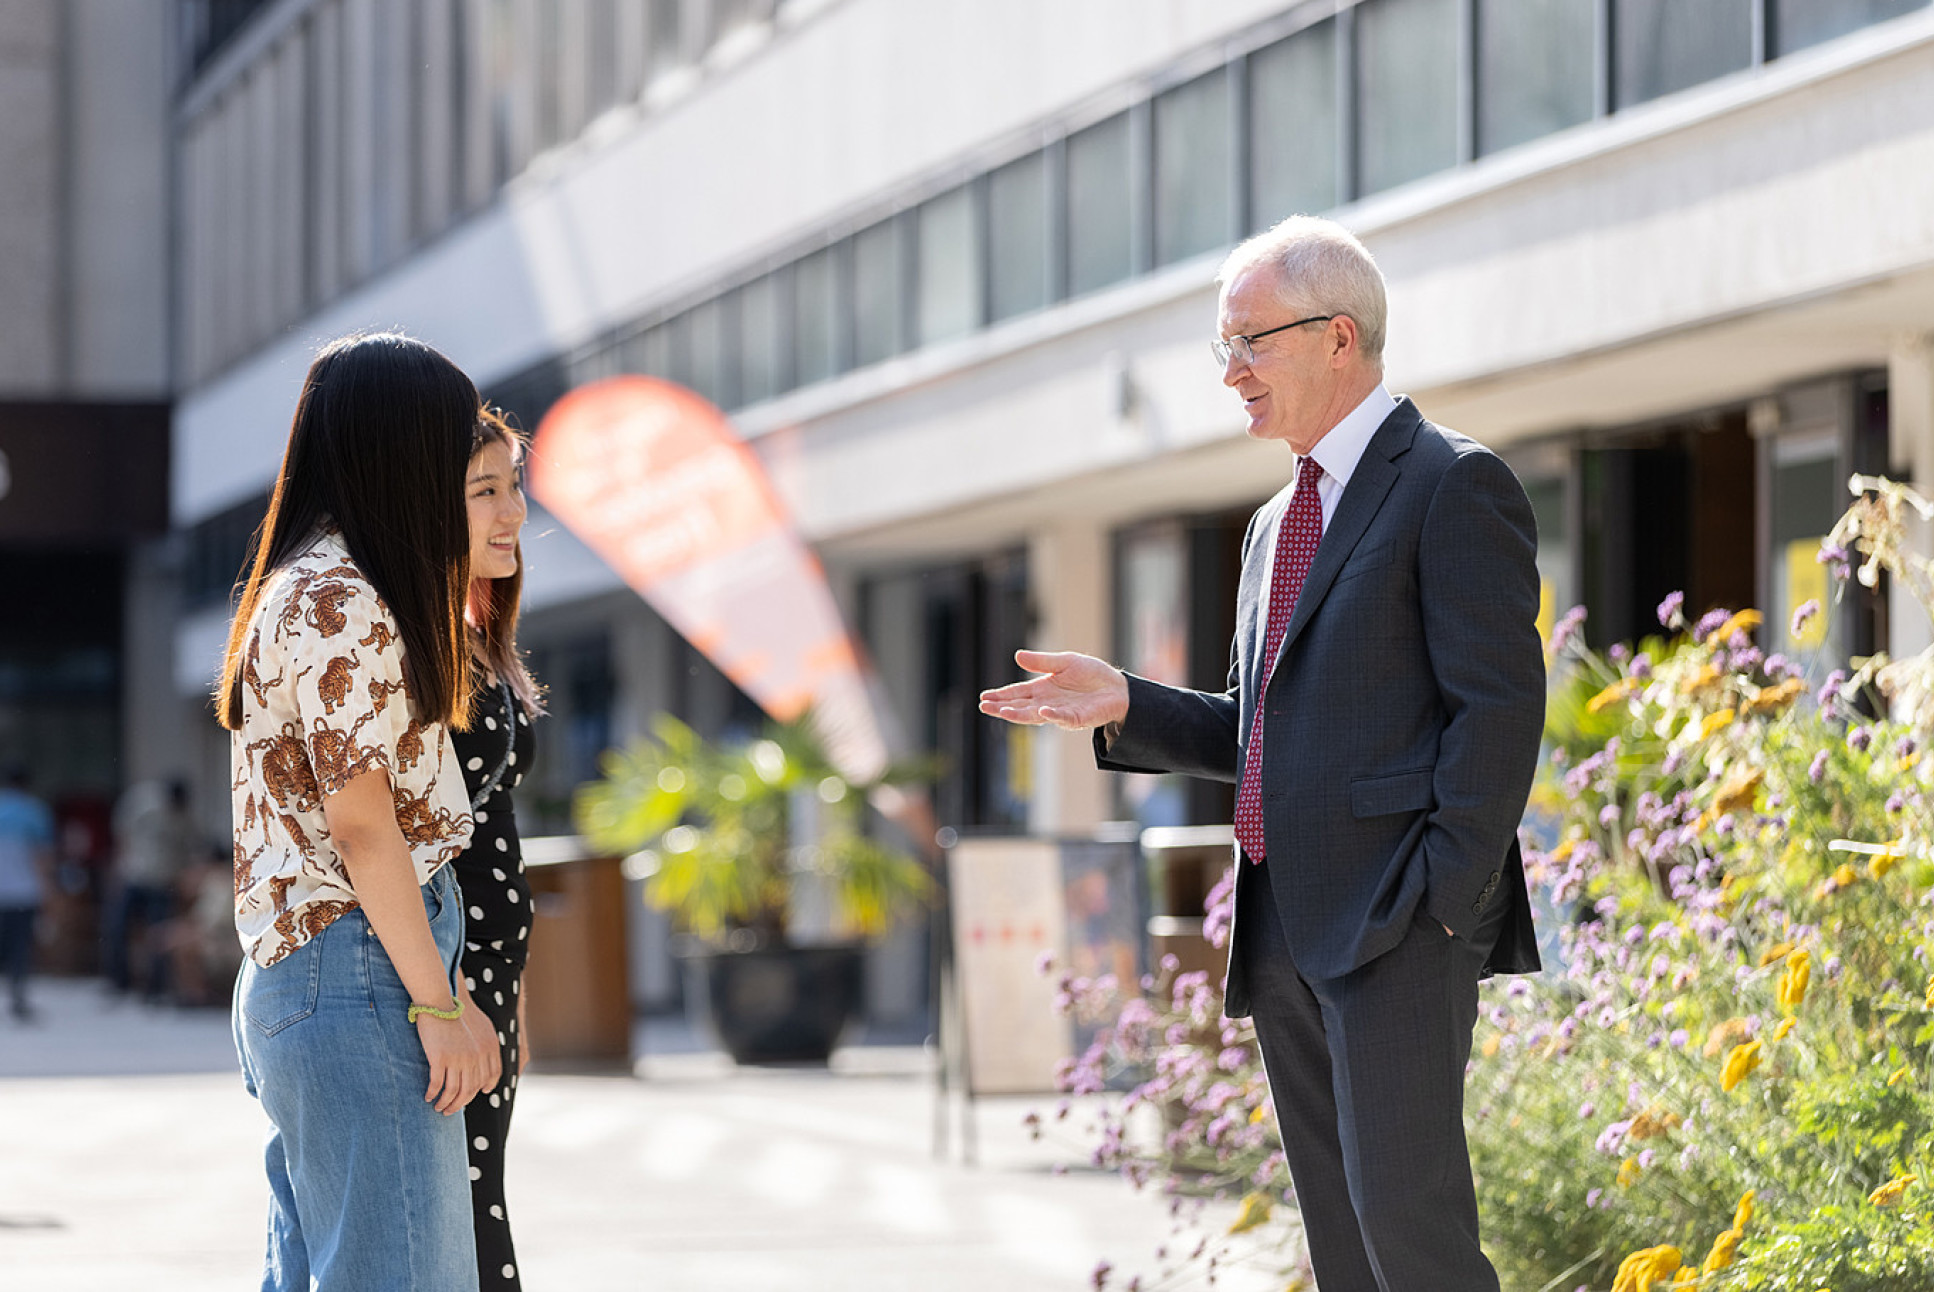 Professor Hugh Brady talking to students on campus